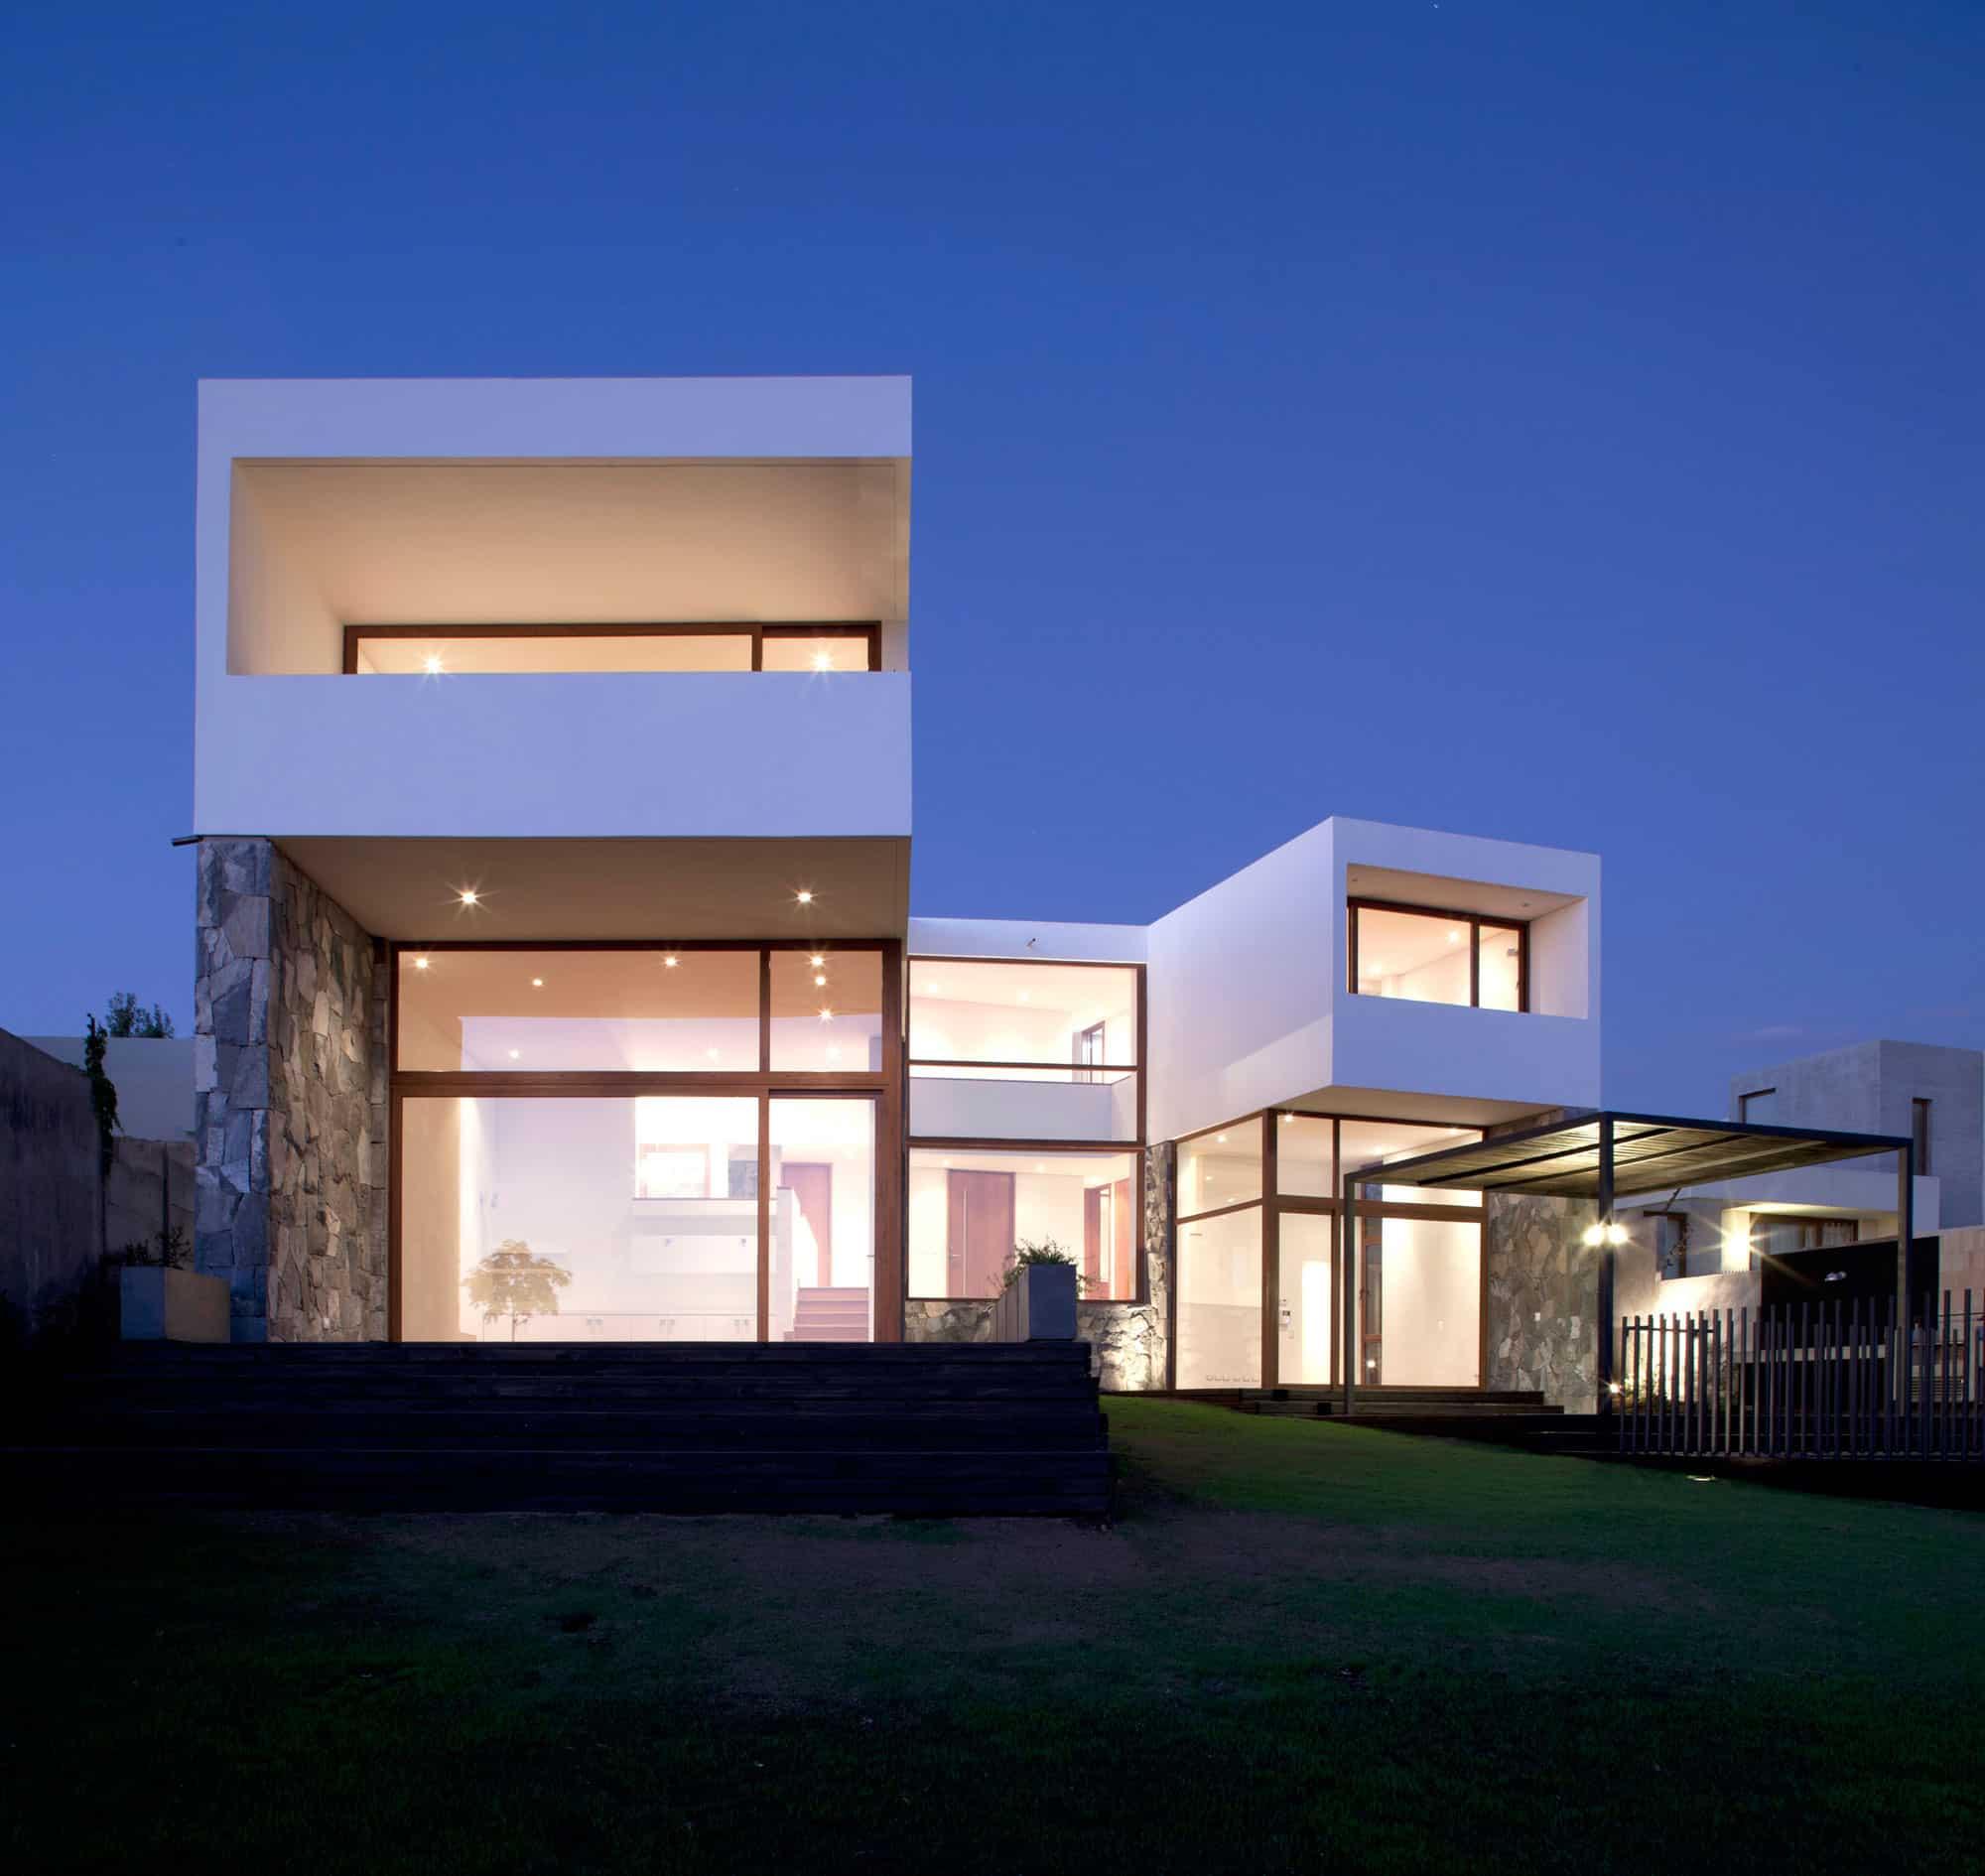 Donoso – Smith House by EMa arquitectos + Raimundo Salgado